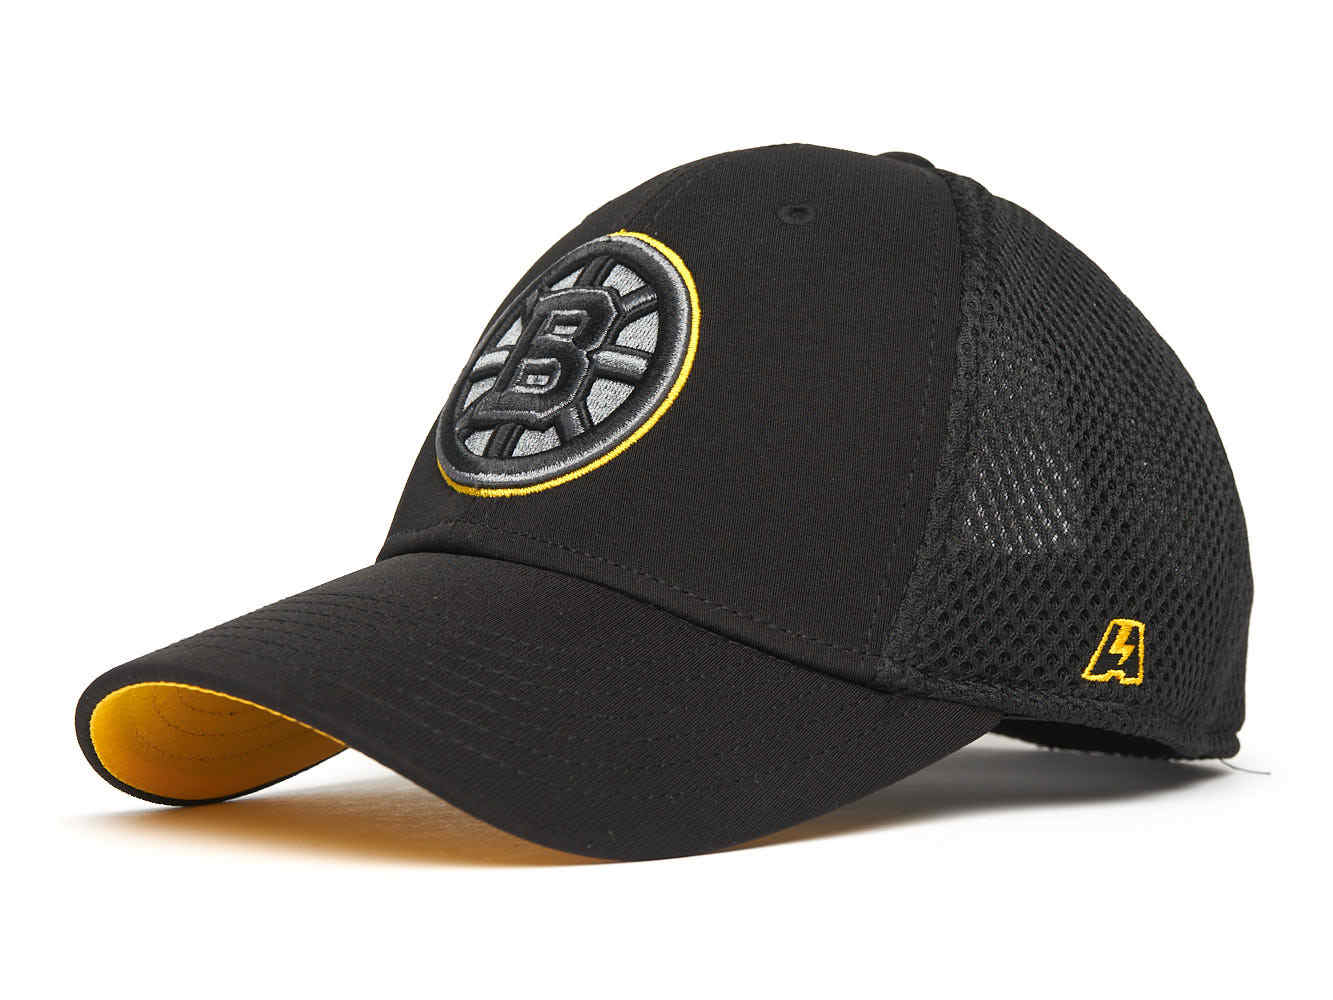 Бейсболка NHL Boston Bruins (размер S)